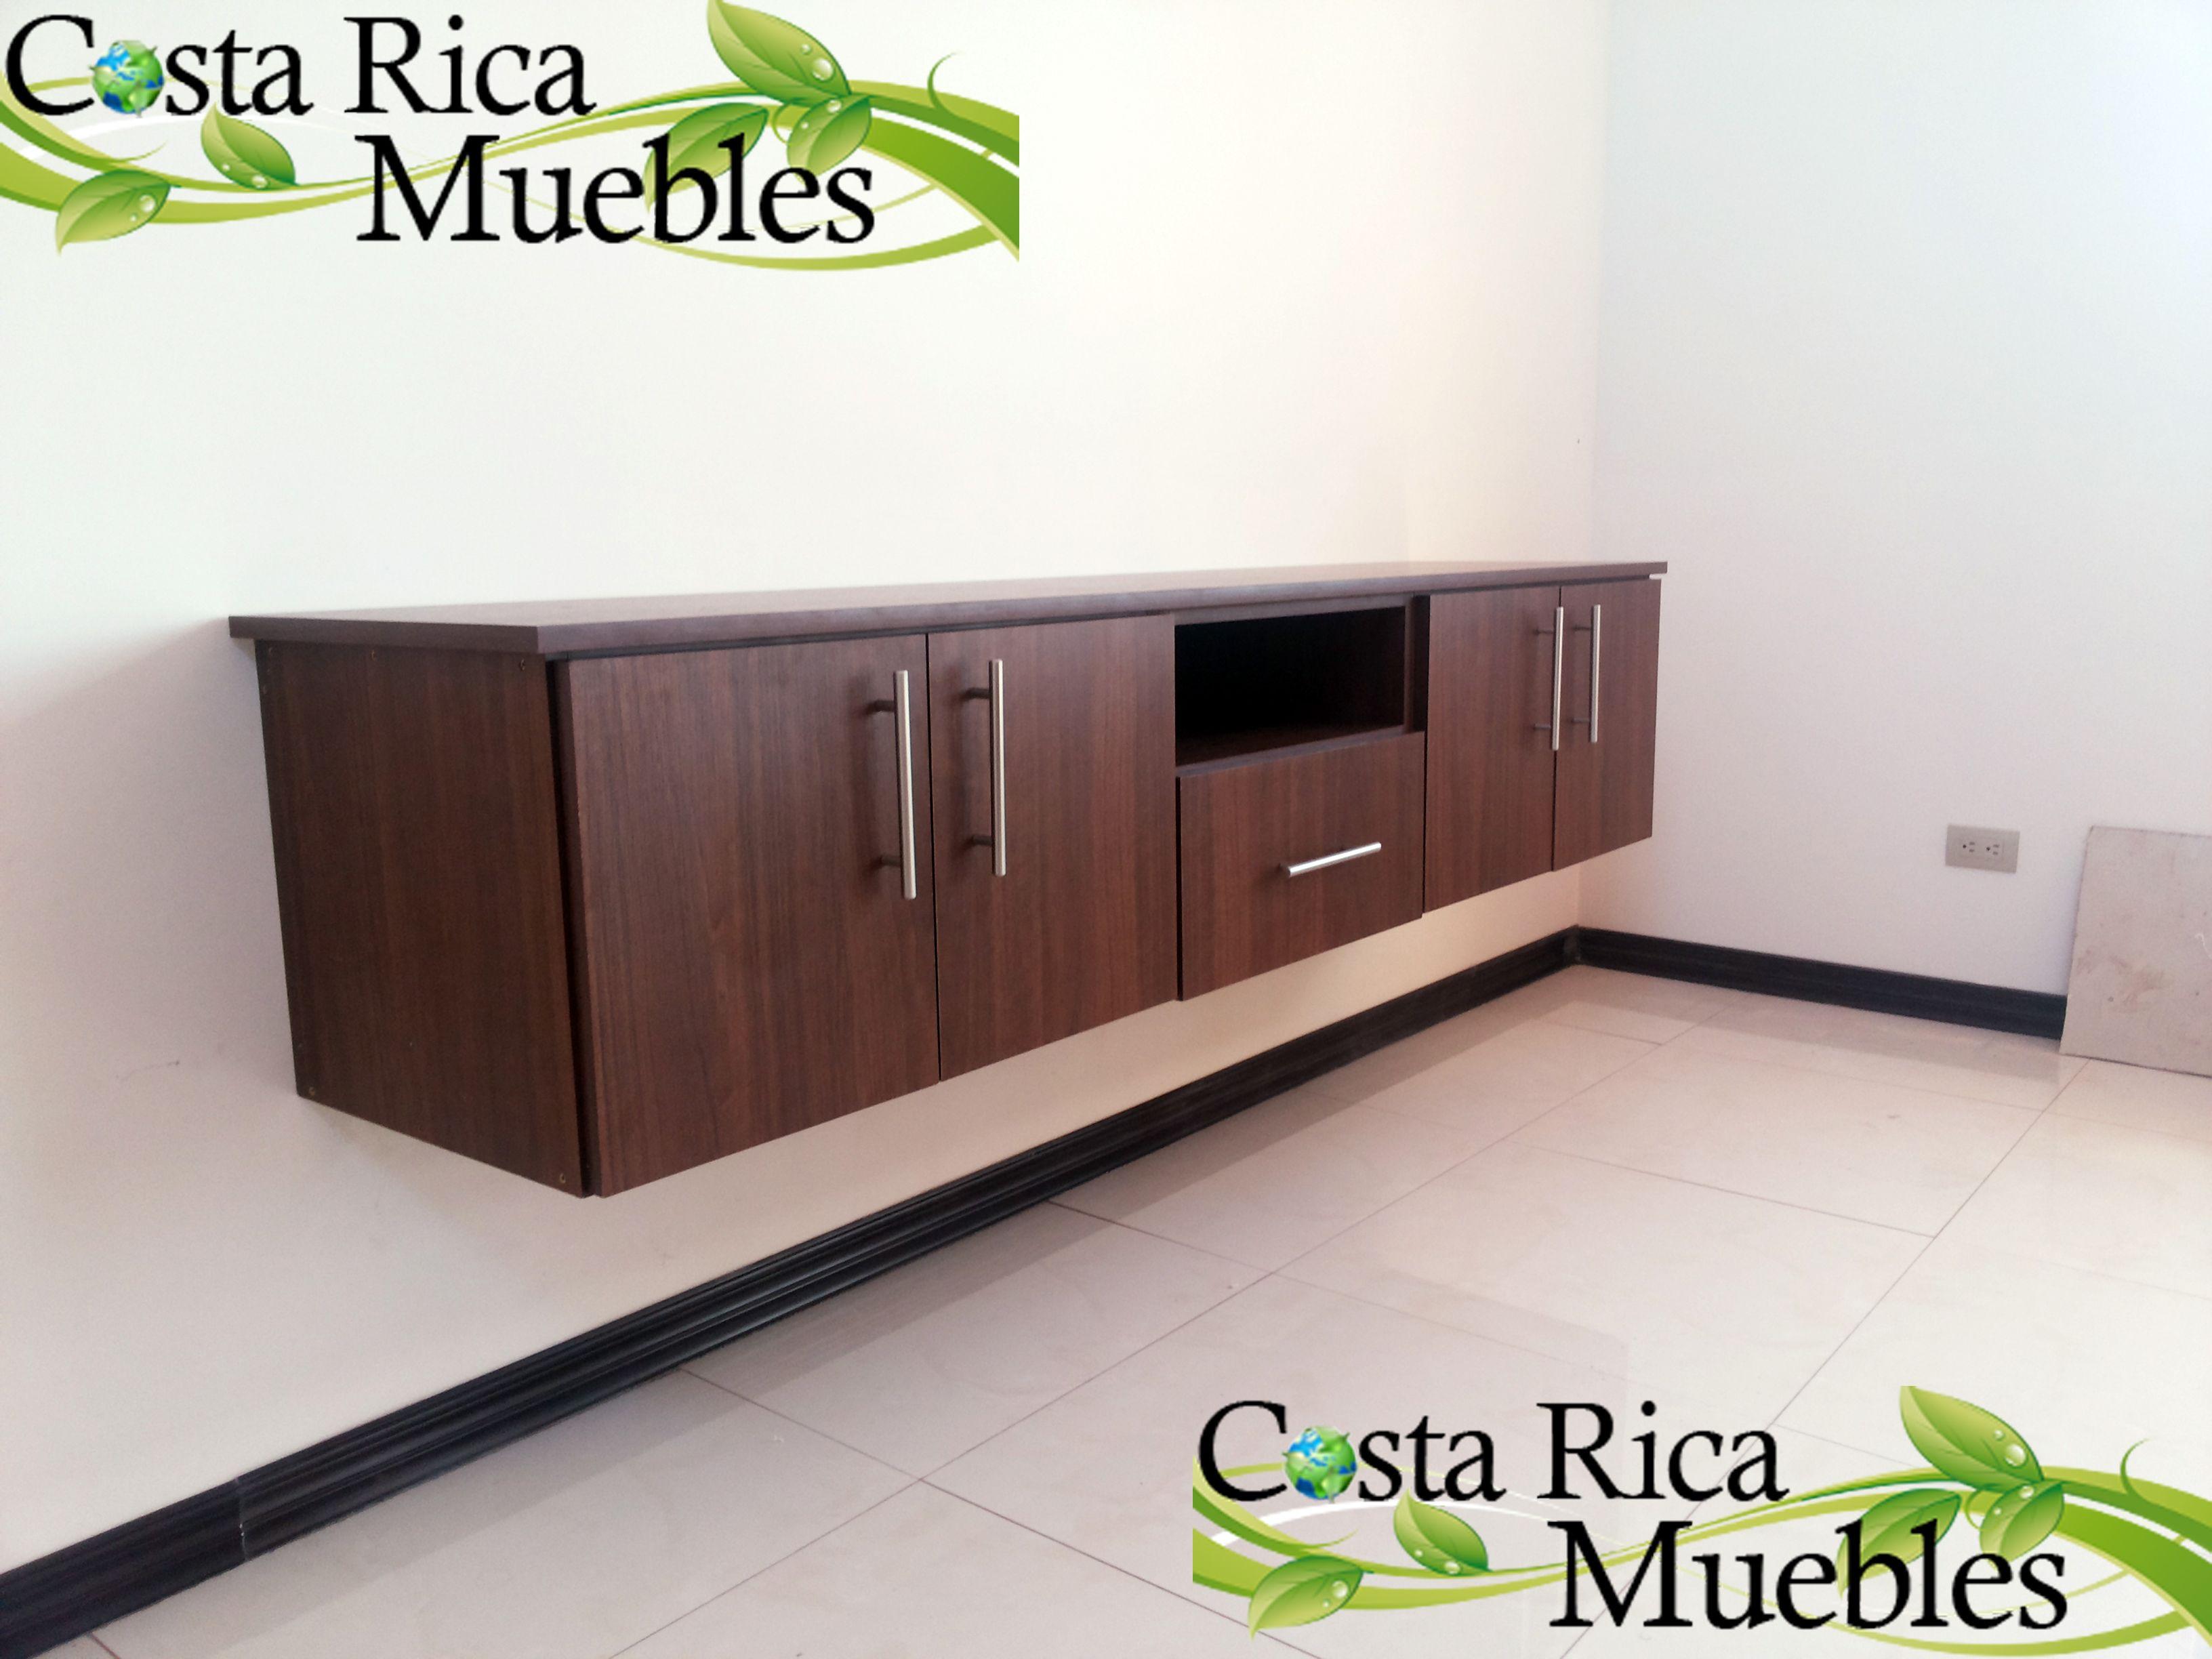 Mueble Suspendido Cuarto T V Instalaci N Seg N Dise O Acordado A  # Muebles Caoba Sevilla